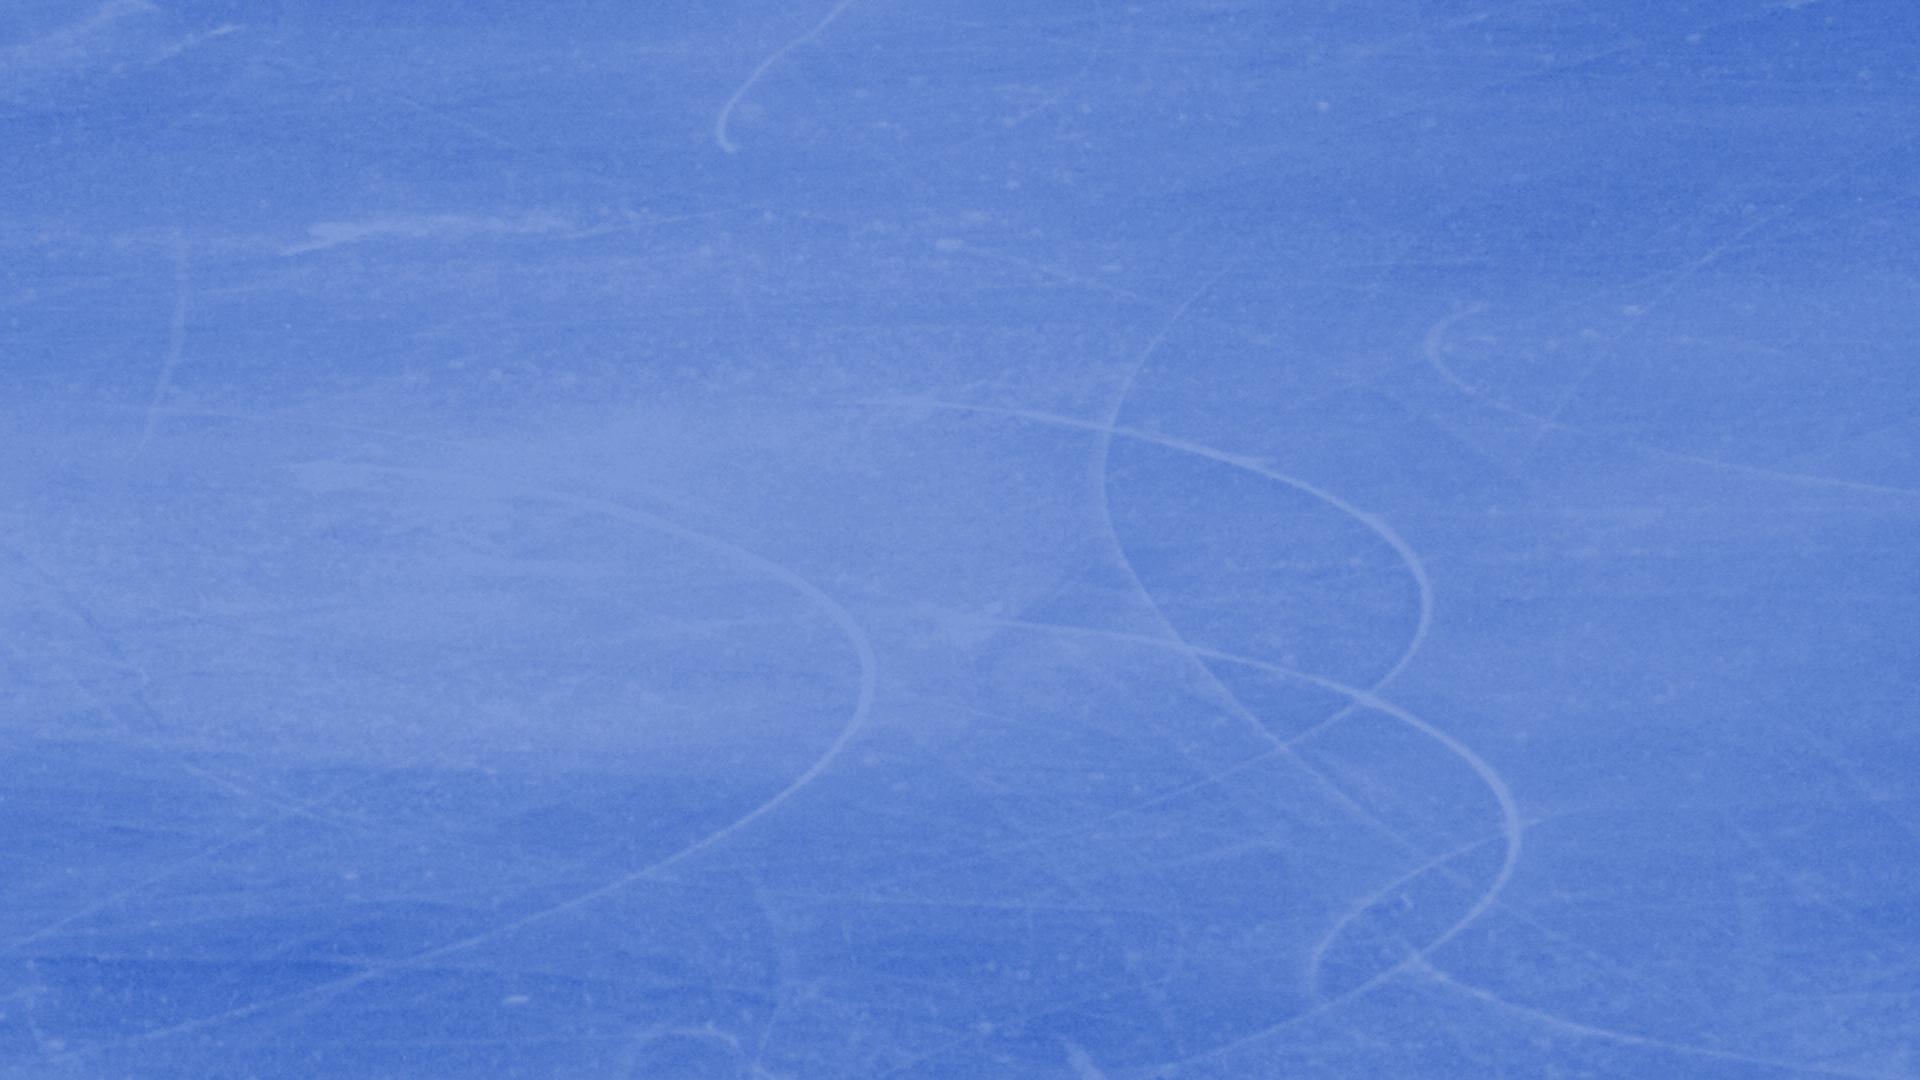 background-ice